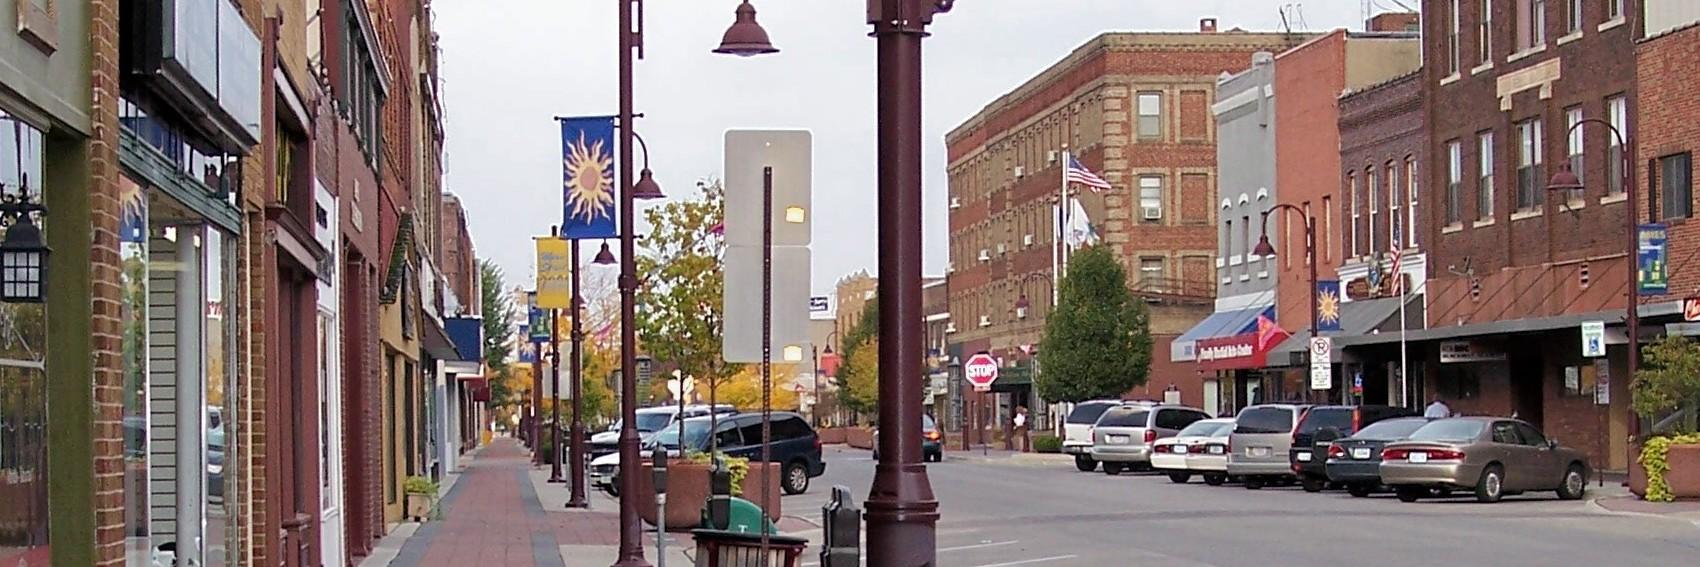 File:Ames Iowa Main Street (bannerportada esvoy2).jpg - Wikimedia ...